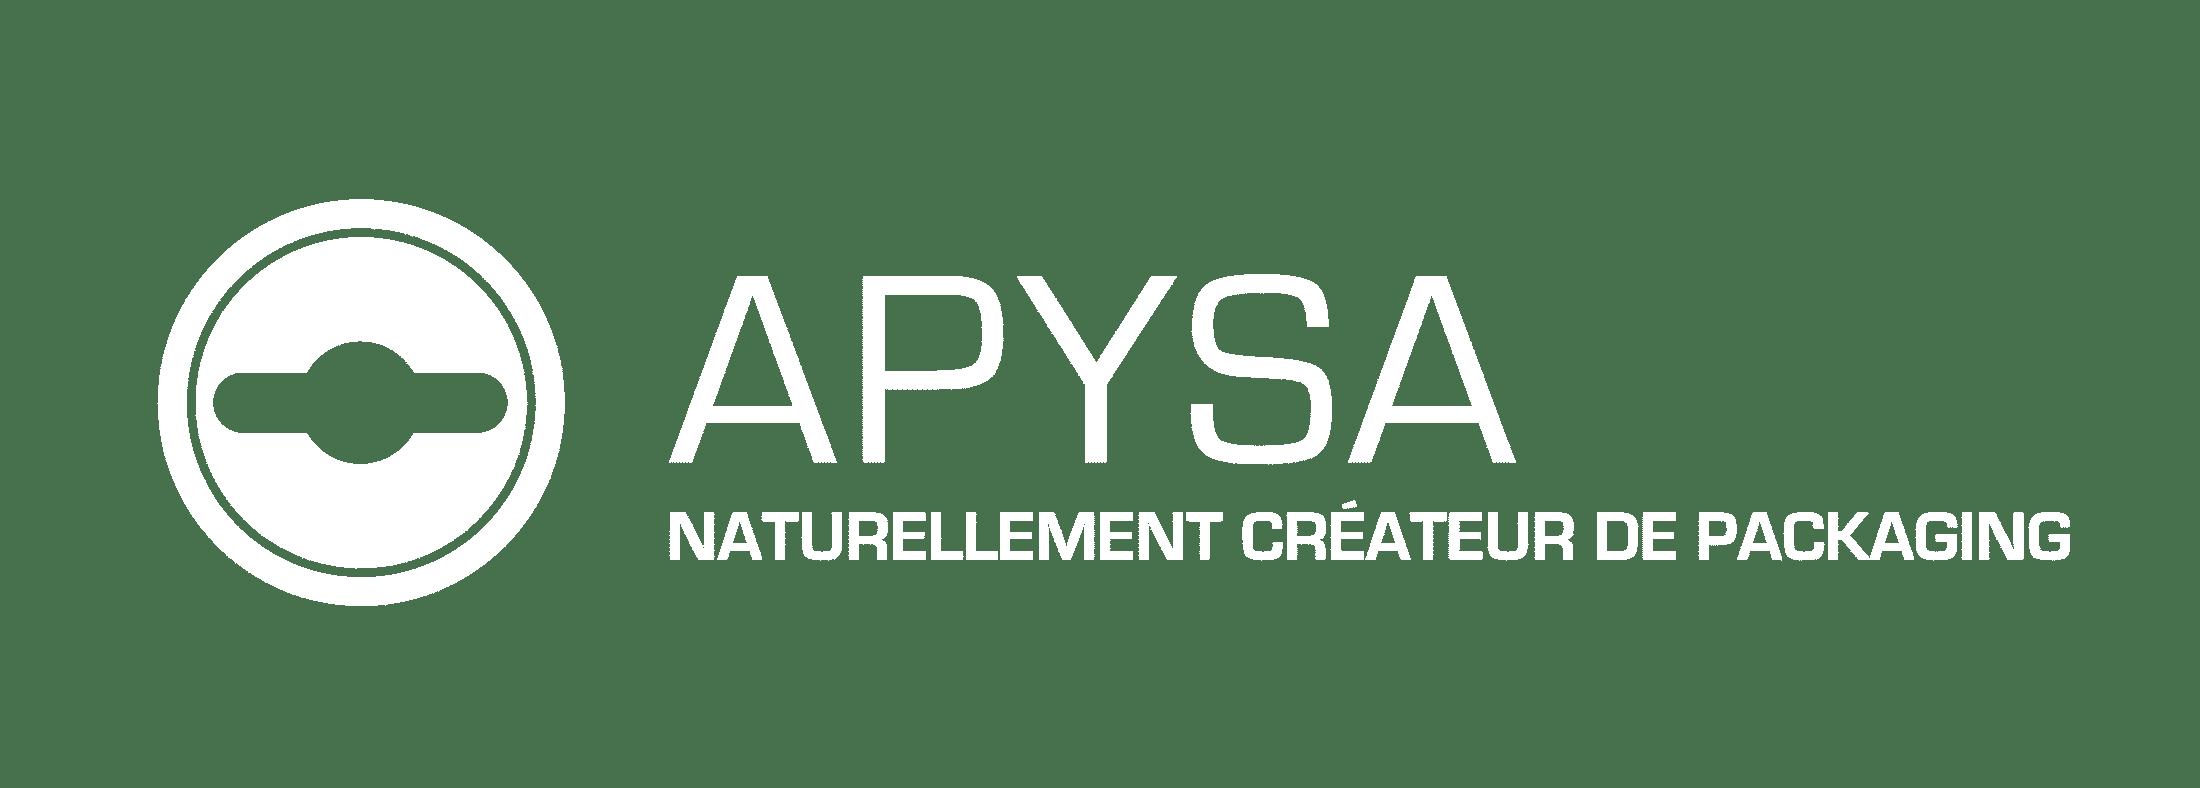 Logo APYSA blanc